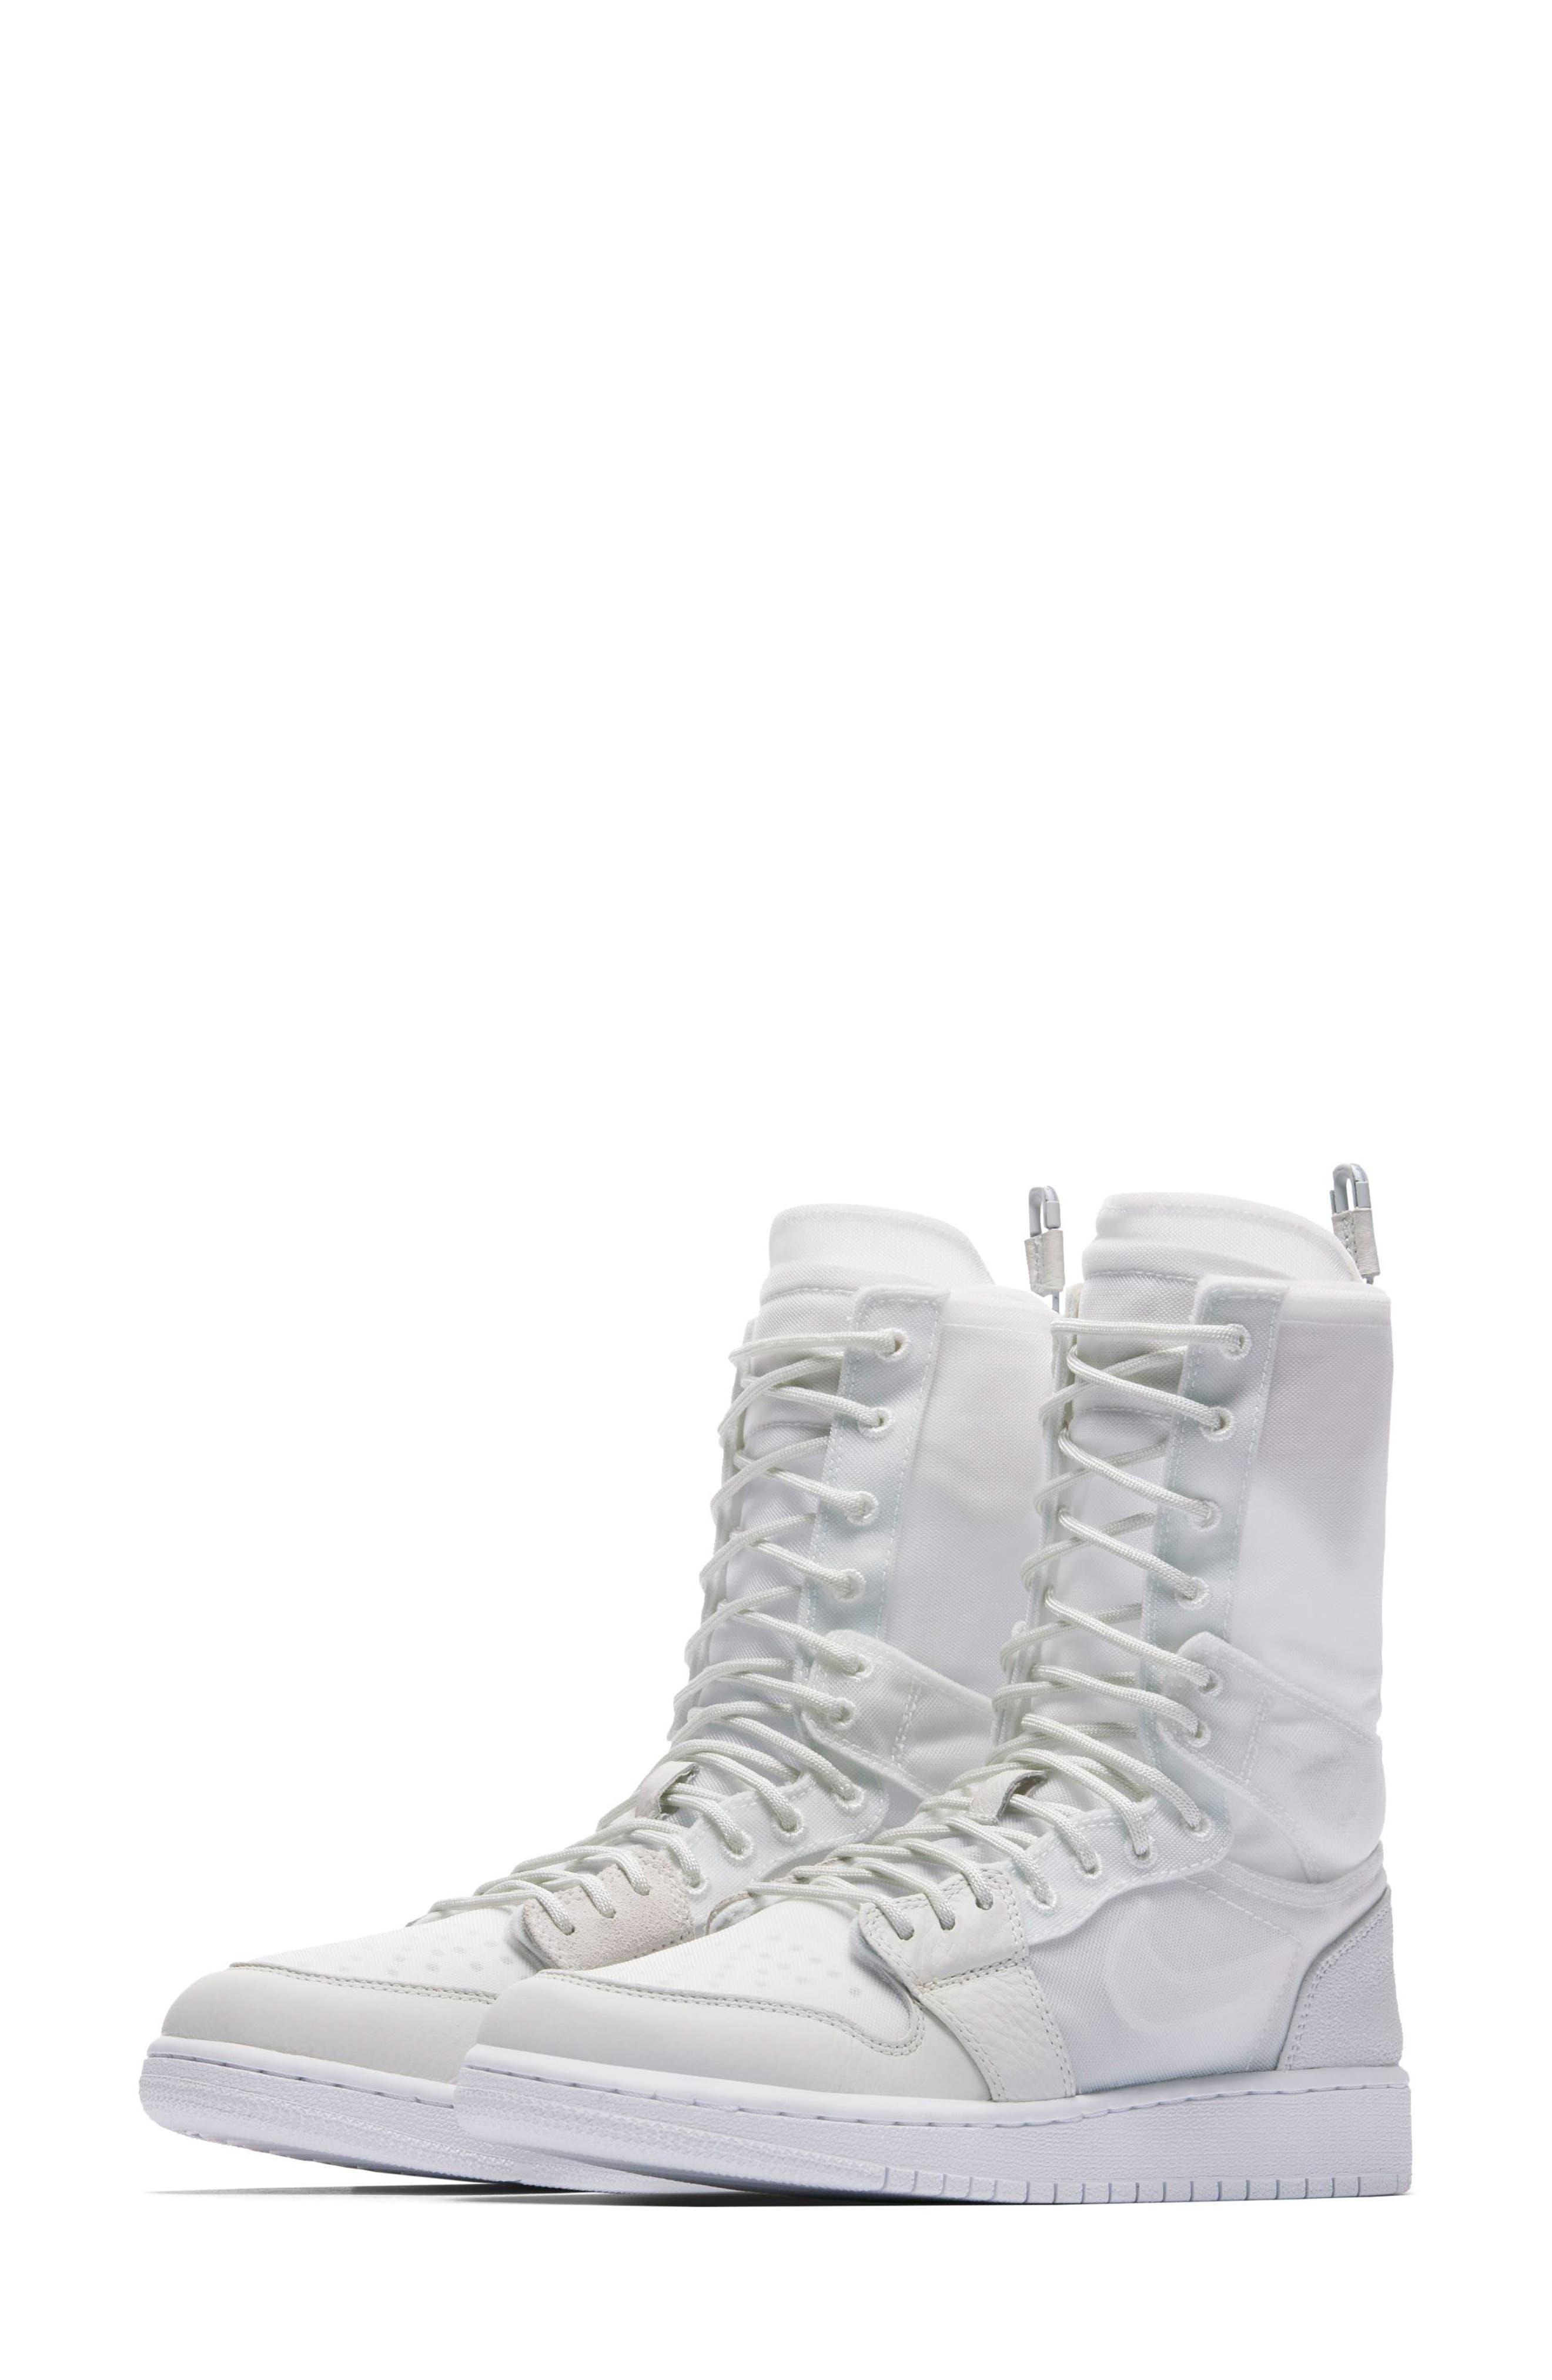 Air Jordan 1 Explorer XX Convertible High Top Sneaker,                             Main thumbnail 1, color,